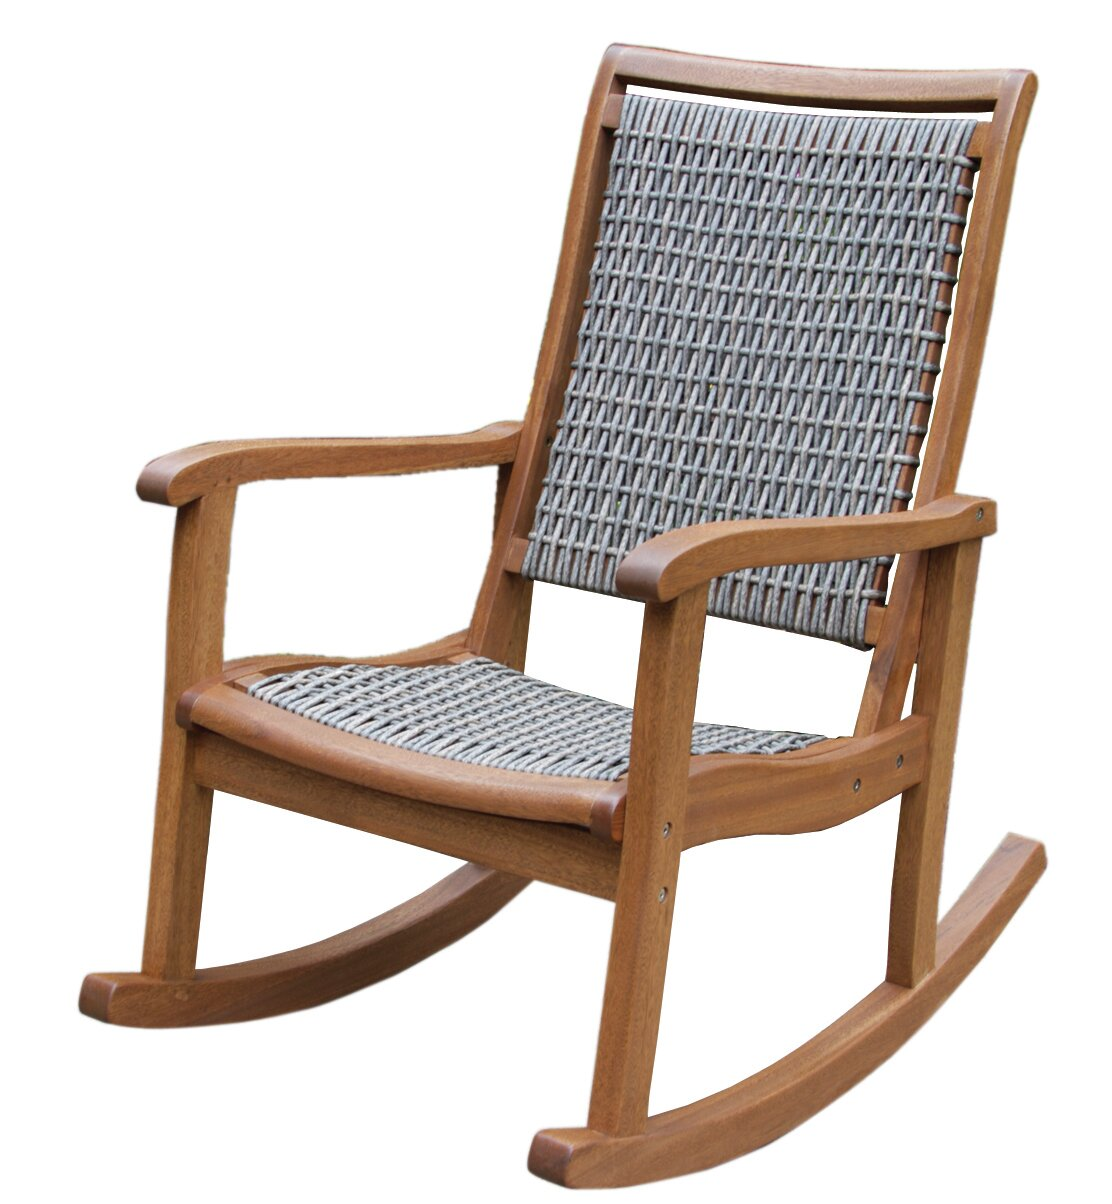 Chair Outdoor Rocking ~ Outdoor interiors resin wicker and eucalyptus rocker chair